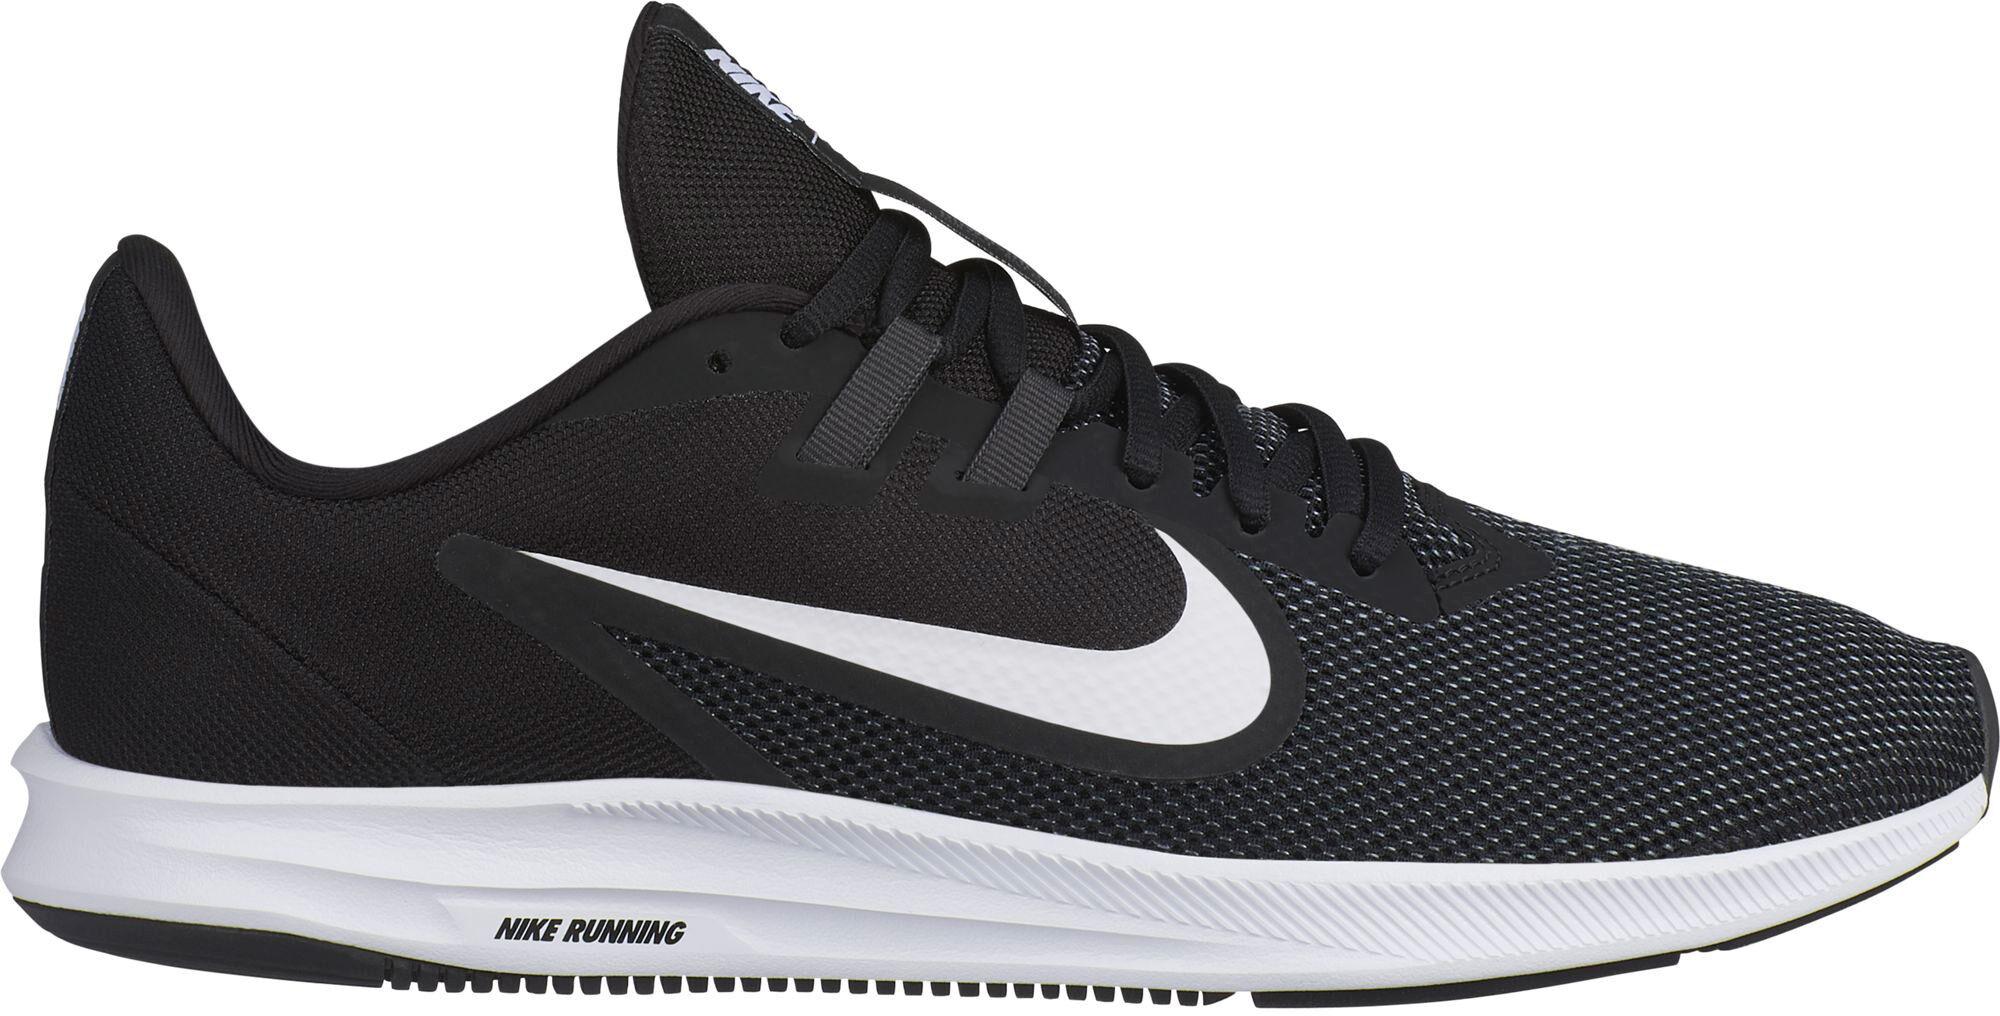 Nike Női Futócipő Féláron Nike Air Zoom Pegasus 34 Fekete